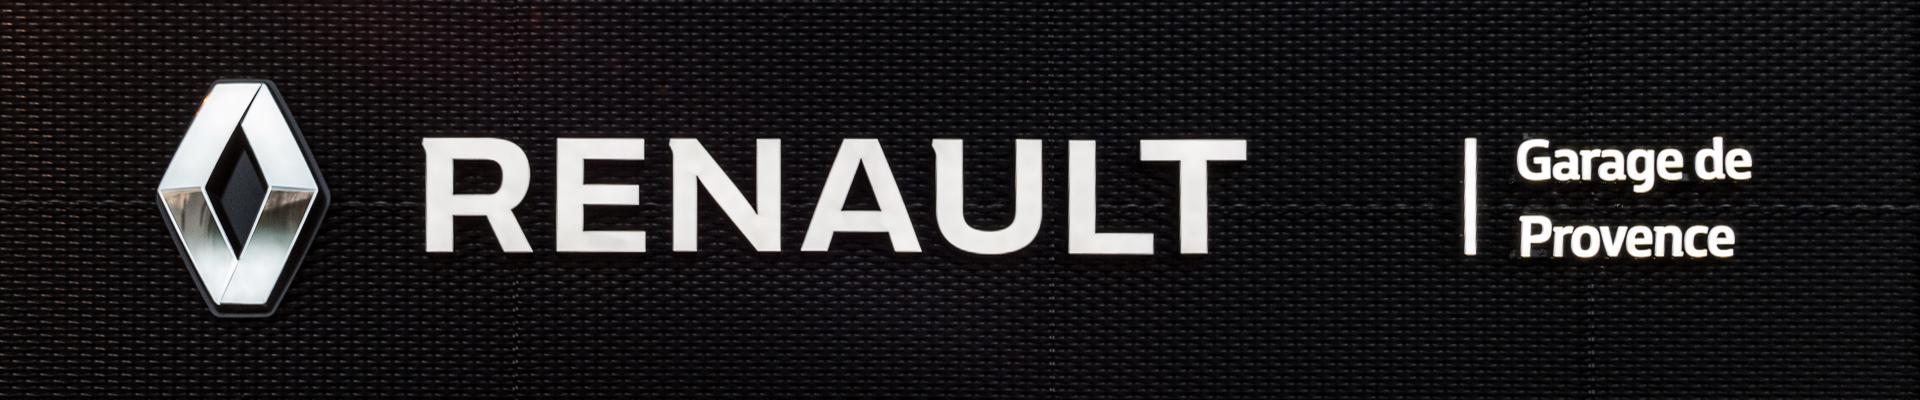 Garage de provence Agent Renault Dacia